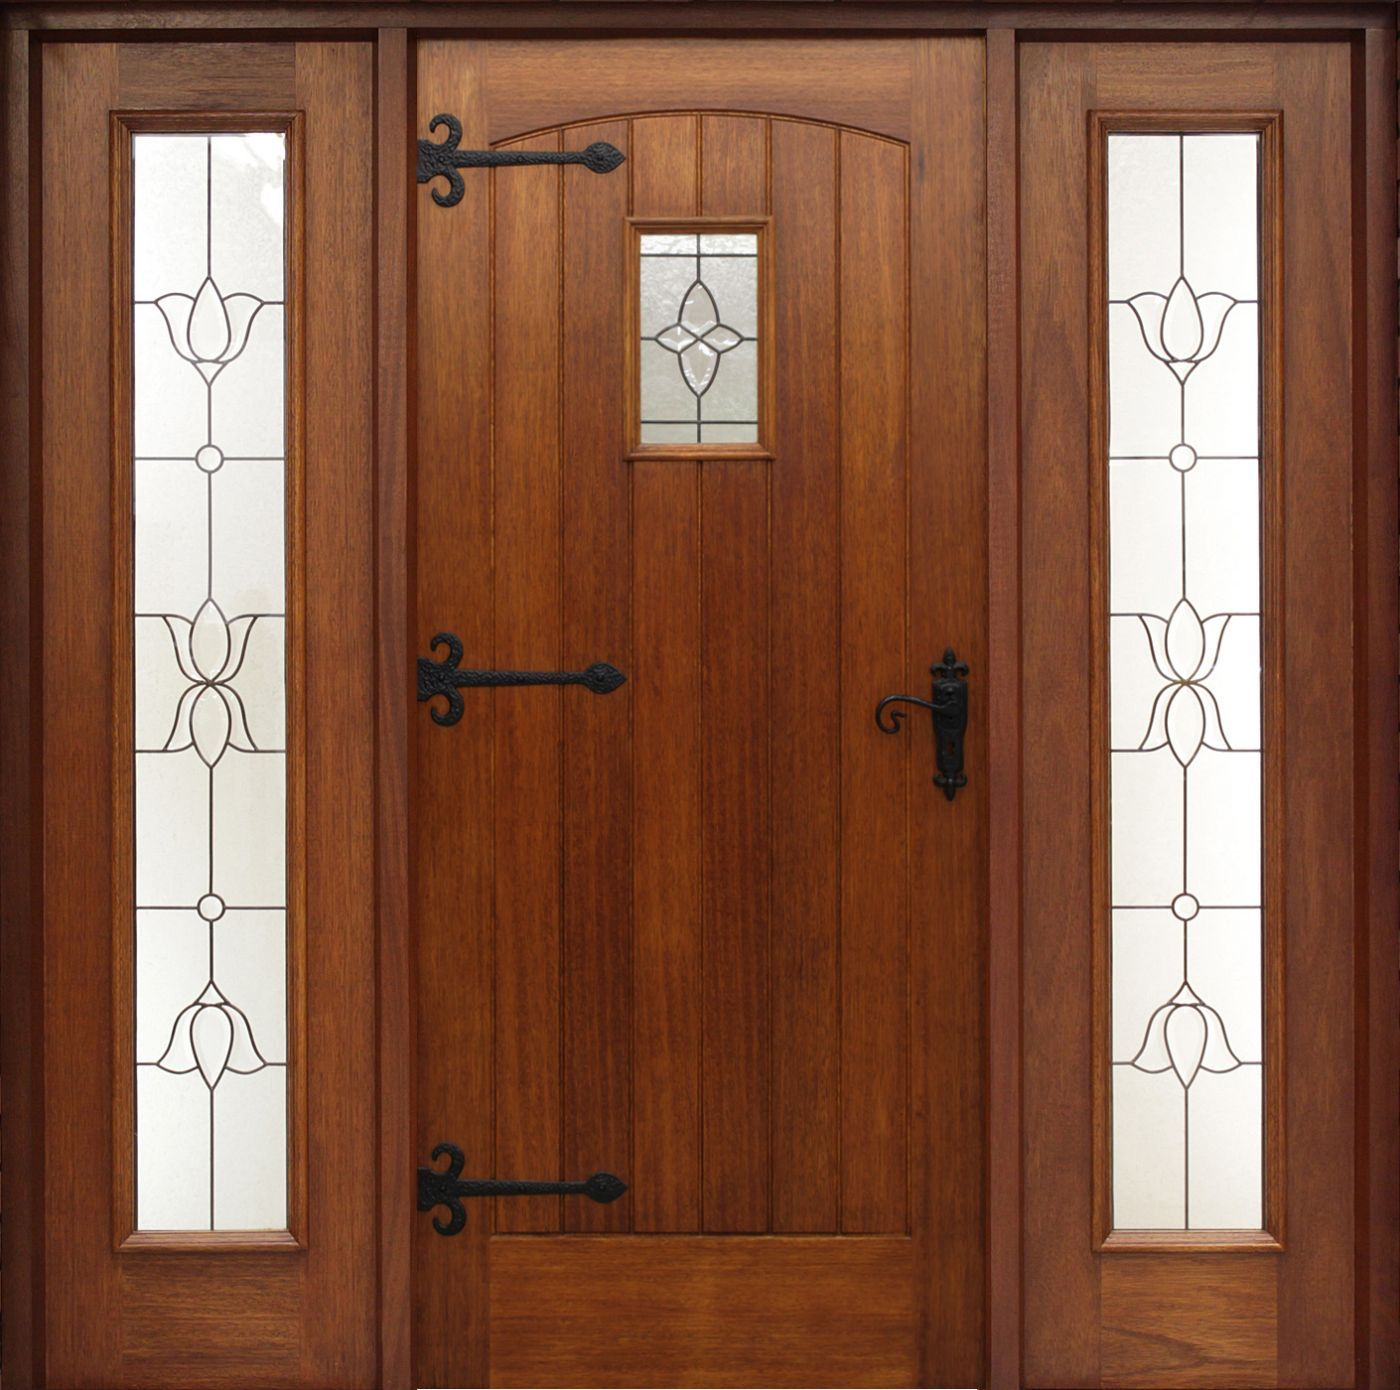 Mobile Home Cottage Door: Cottage Pre-Glazed (44mm) Shown With Sidelights